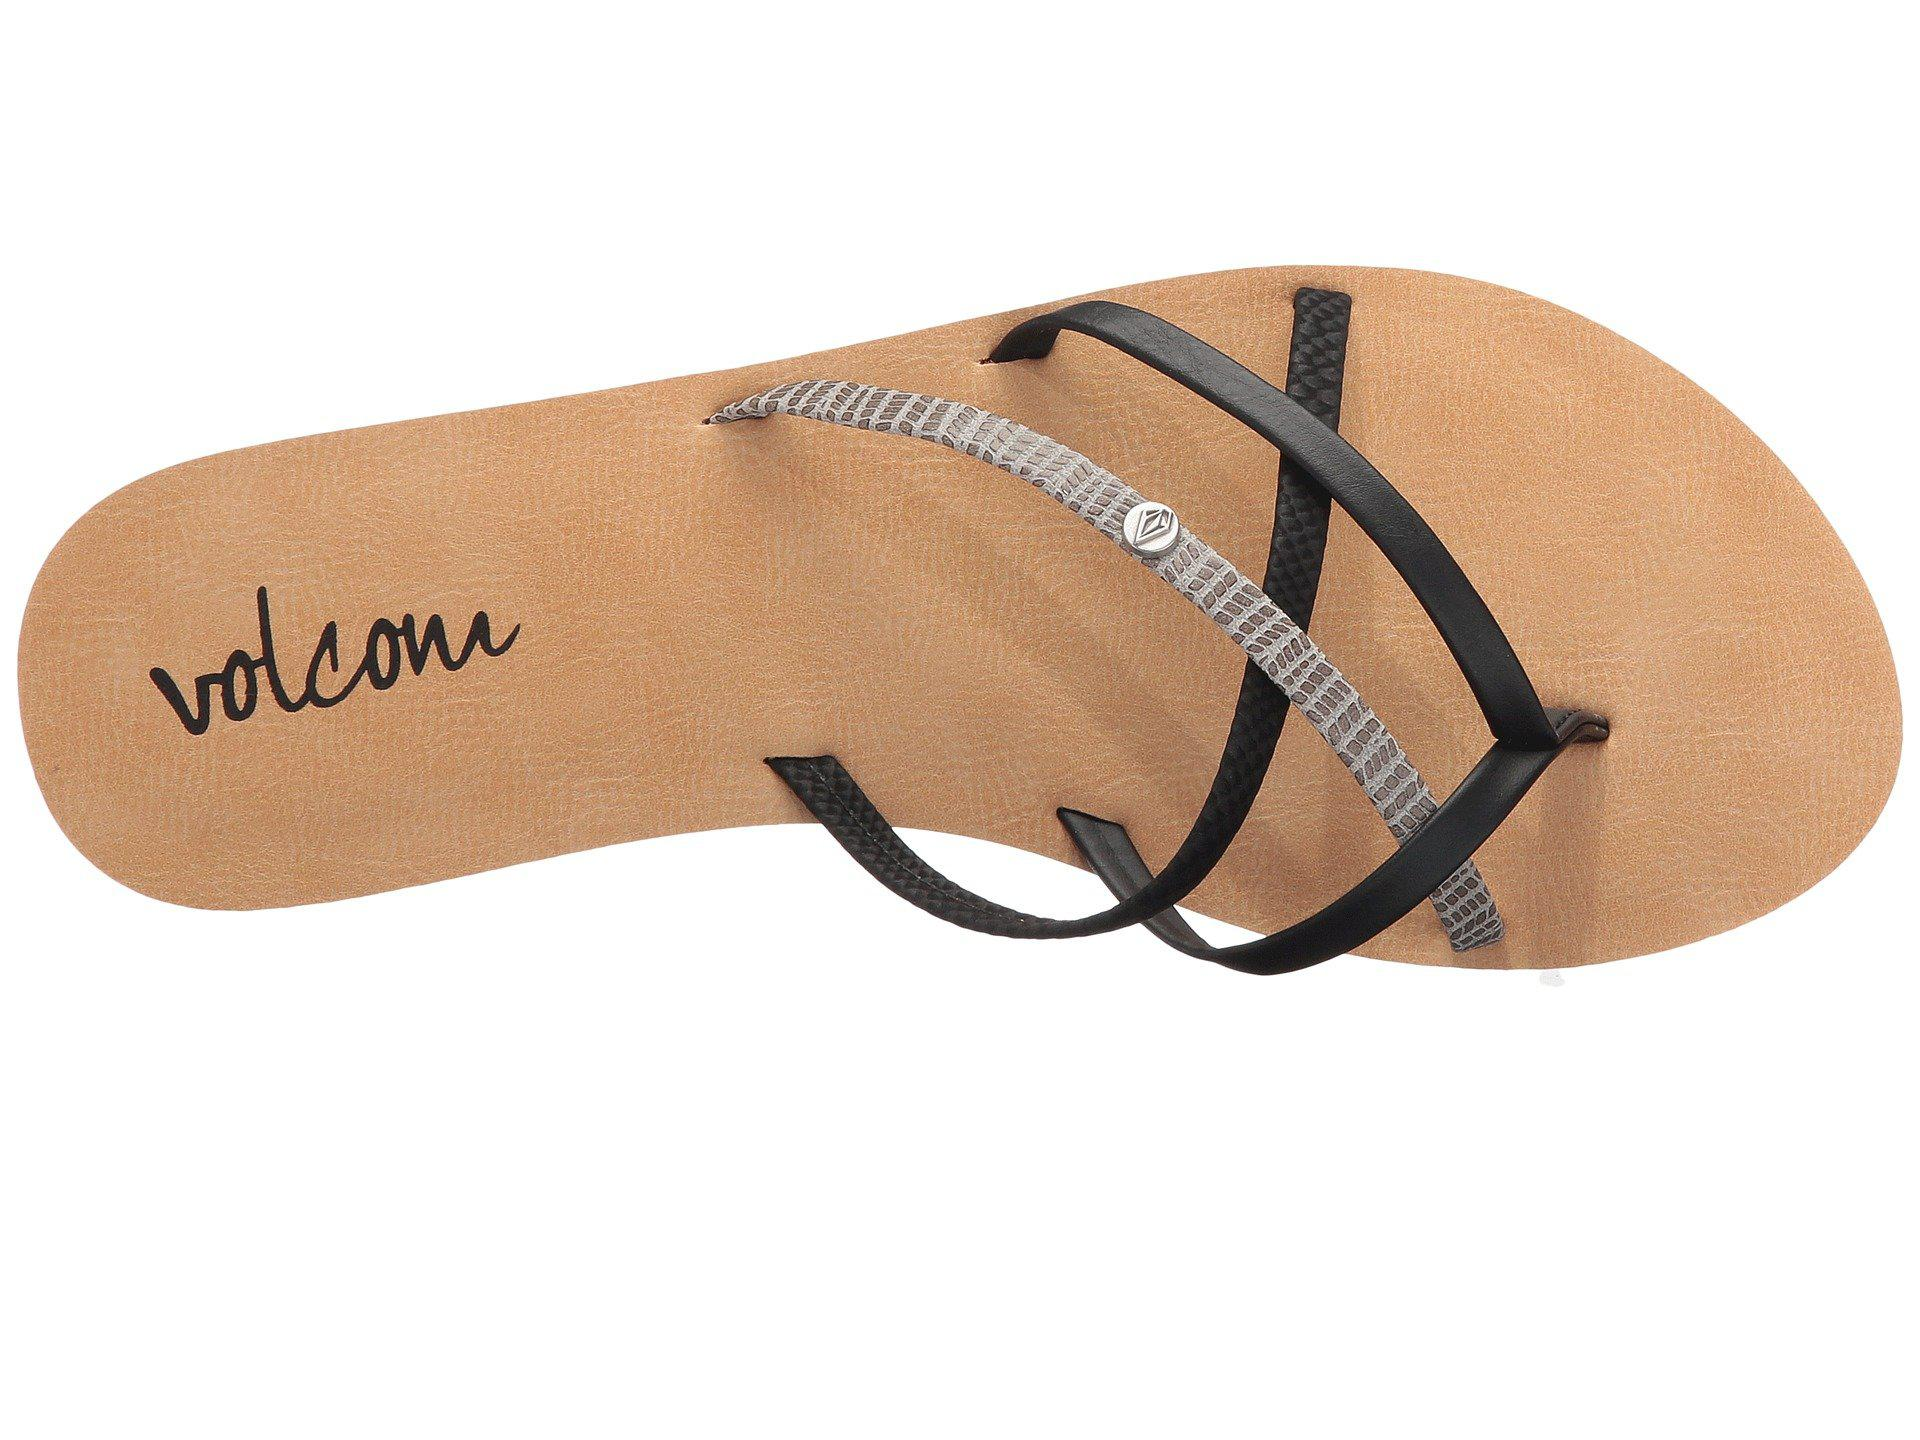 4b2e82479396 Volcom - Black New School 2 (brown) Women s Sandals - Lyst. View fullscreen